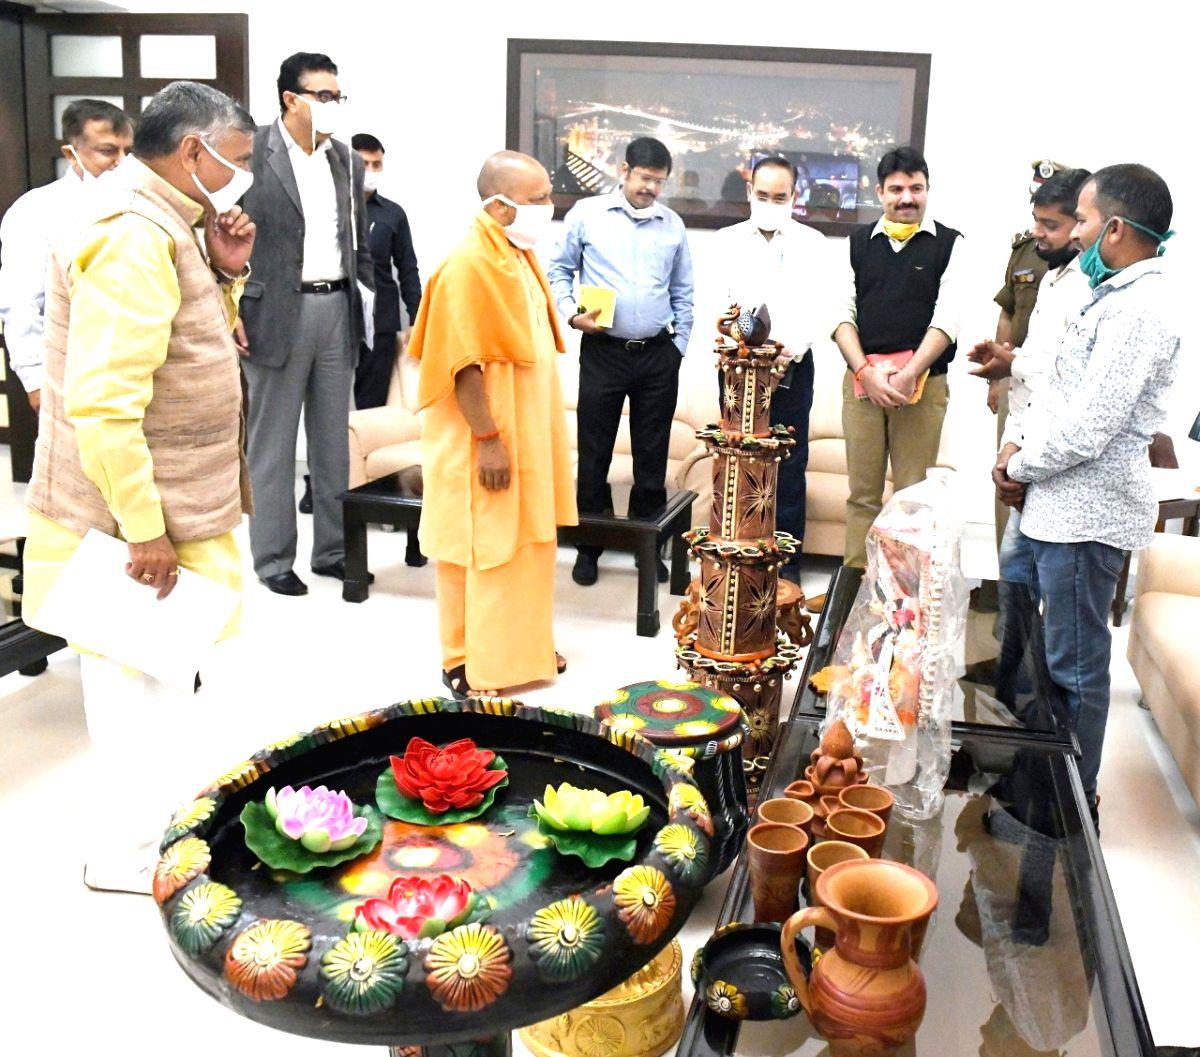 Yogi pays for artisans' gifts to him